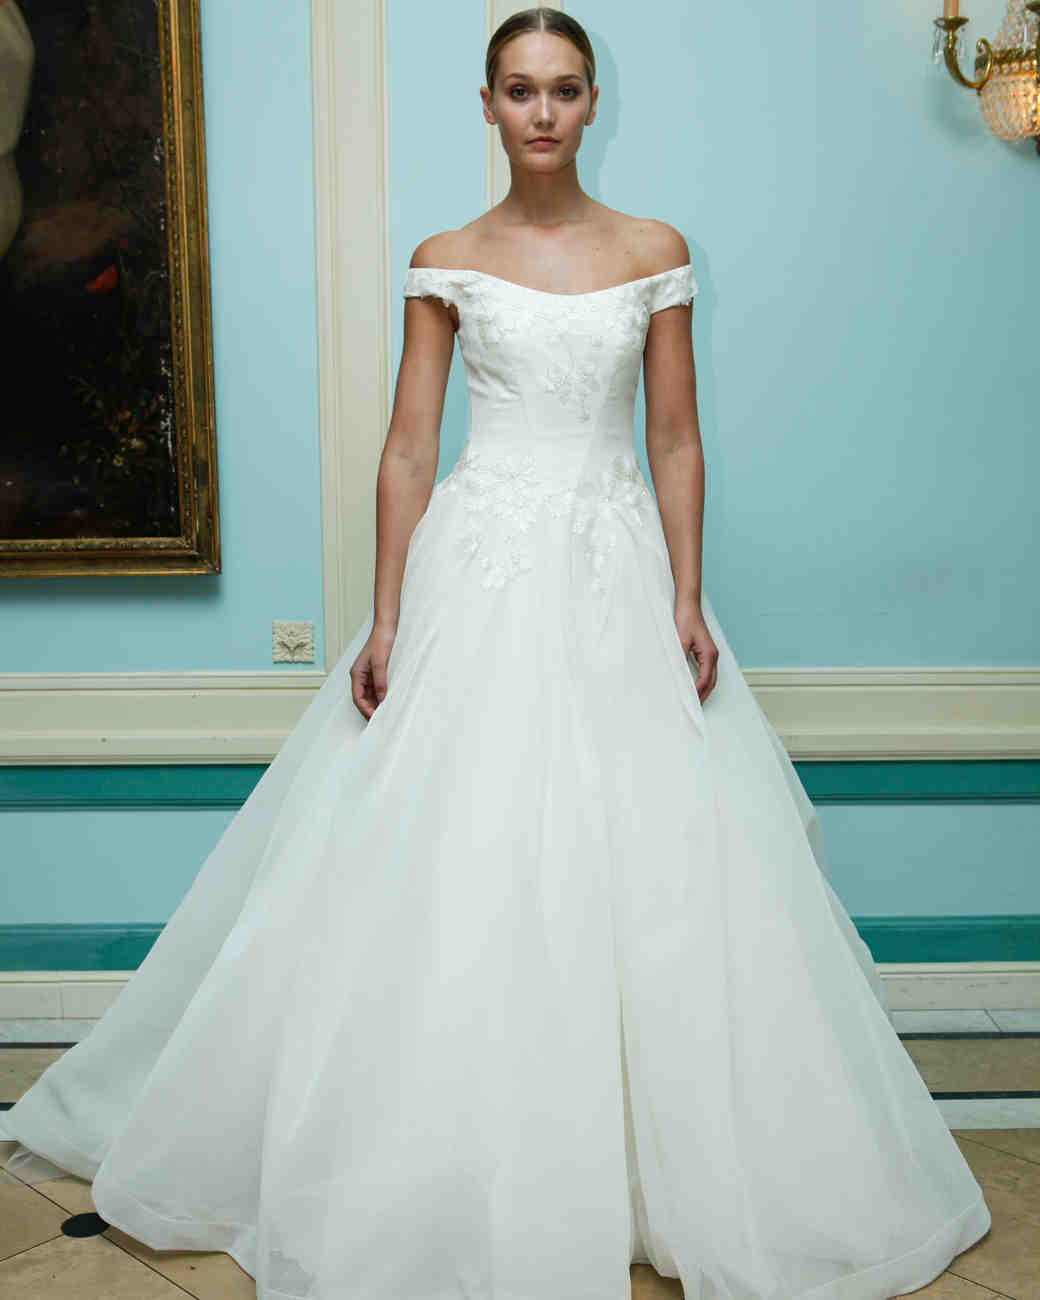 Funky Kerry Katona Wedding Dress Image - Wedding Plan Ideas ...